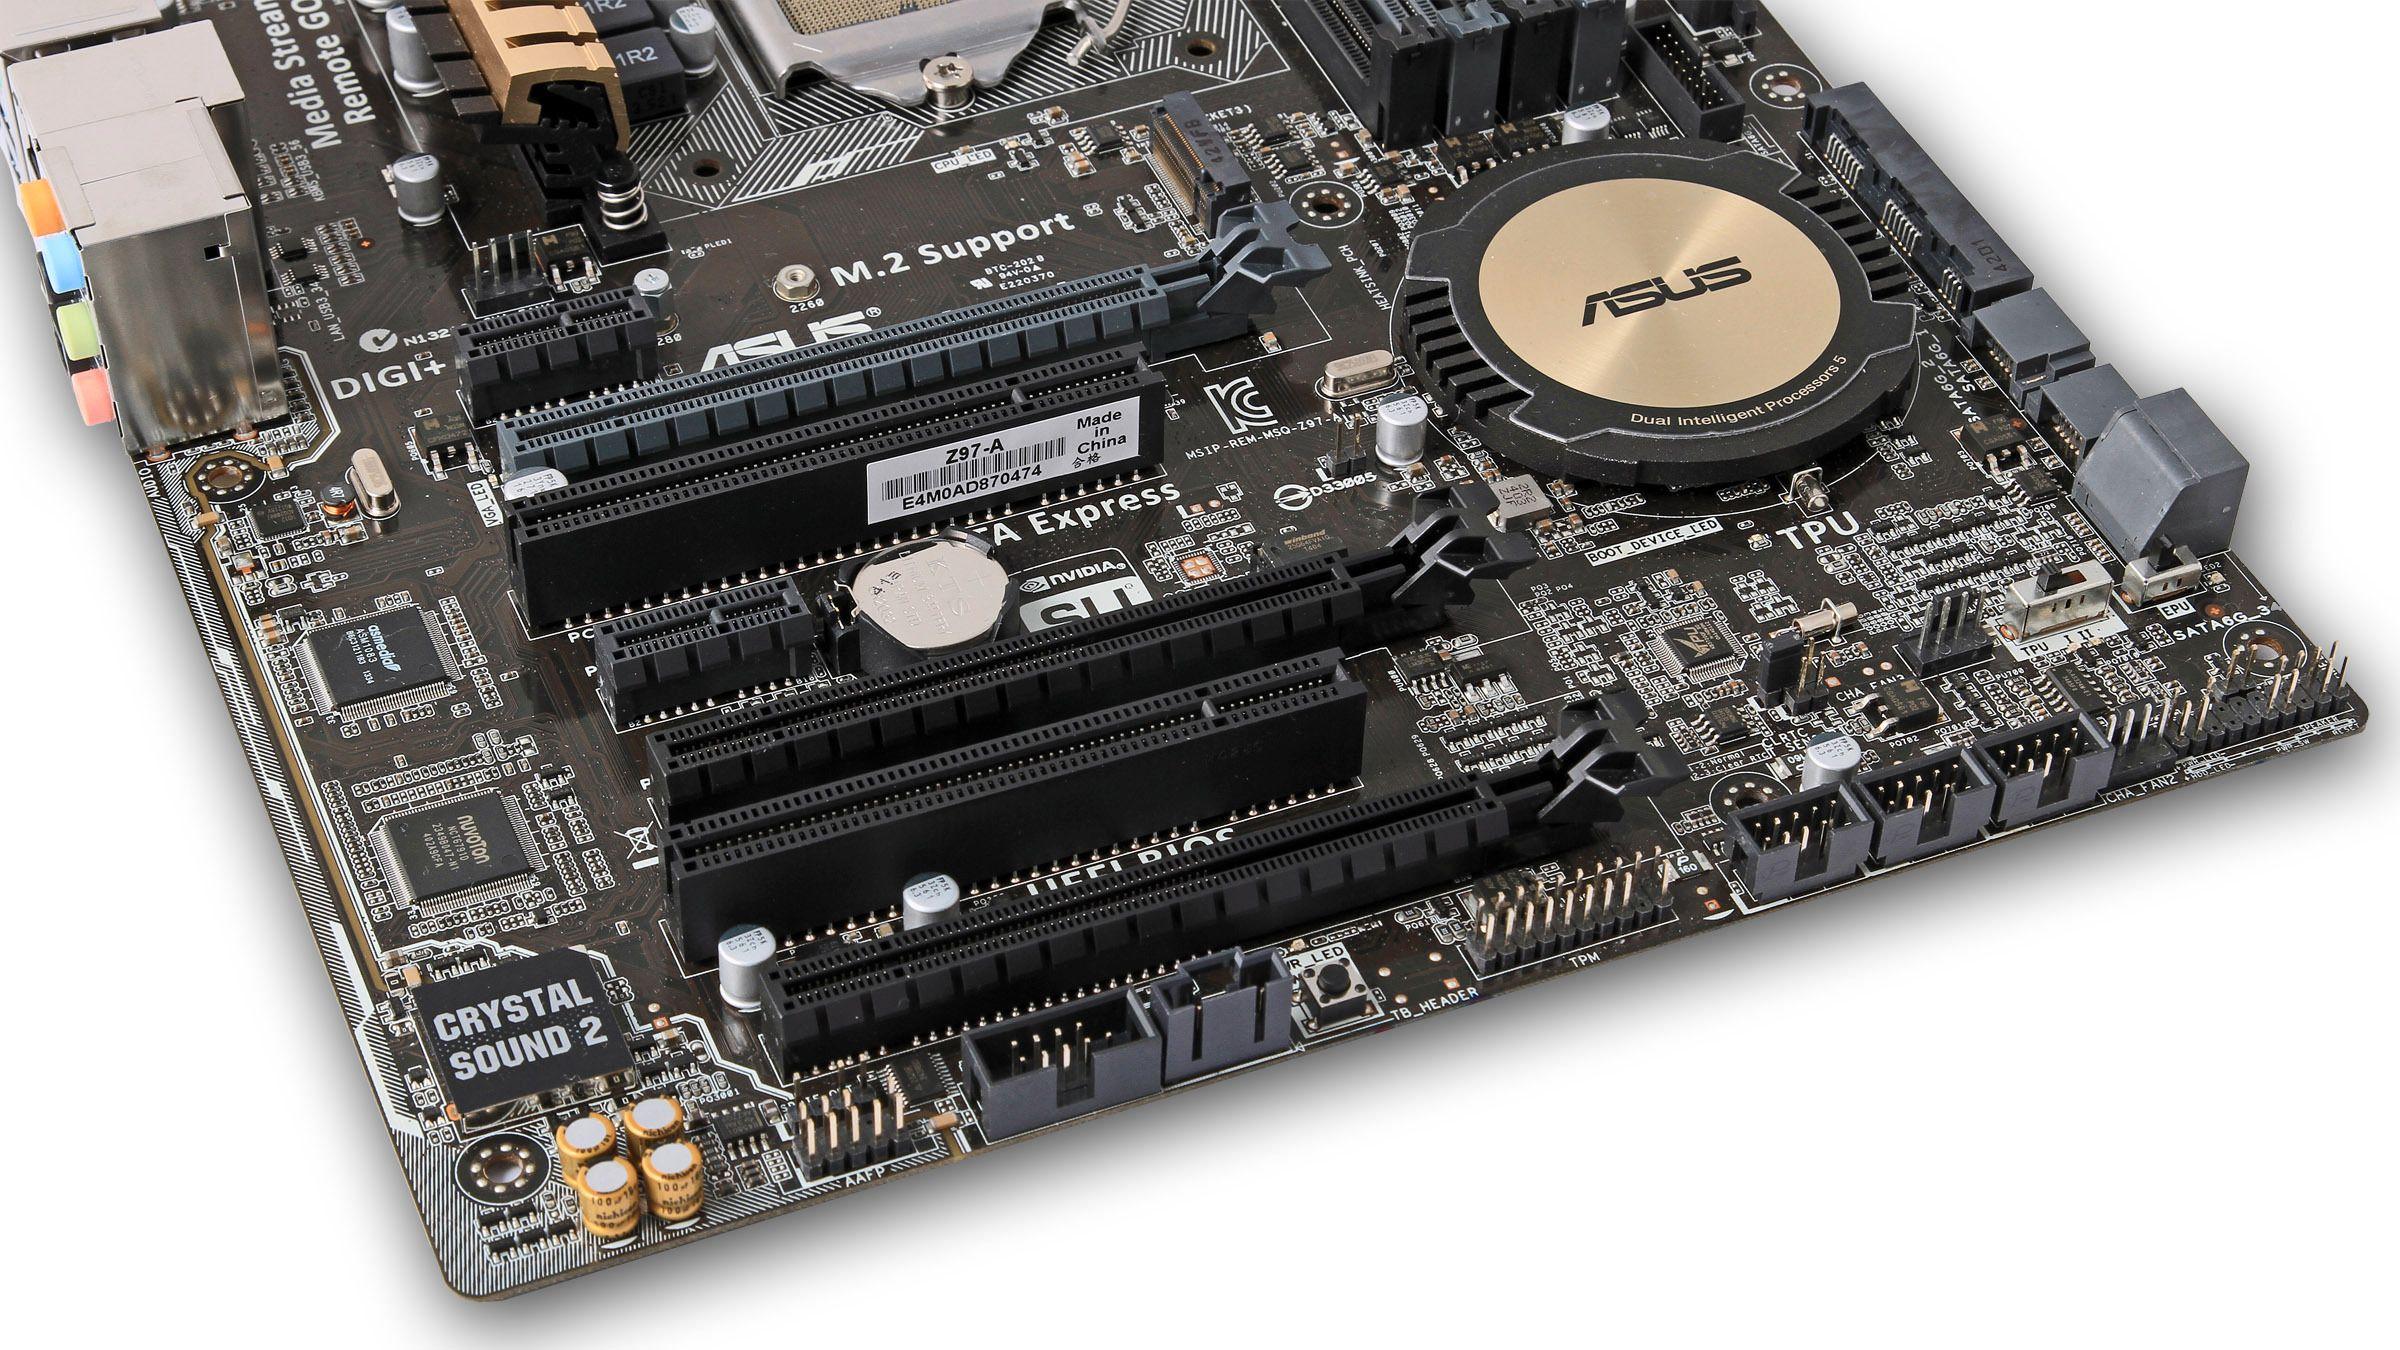 Hovedkortet har tre PCI Express x16-spor, to PCI Express x1-spor og to PCI-spor.